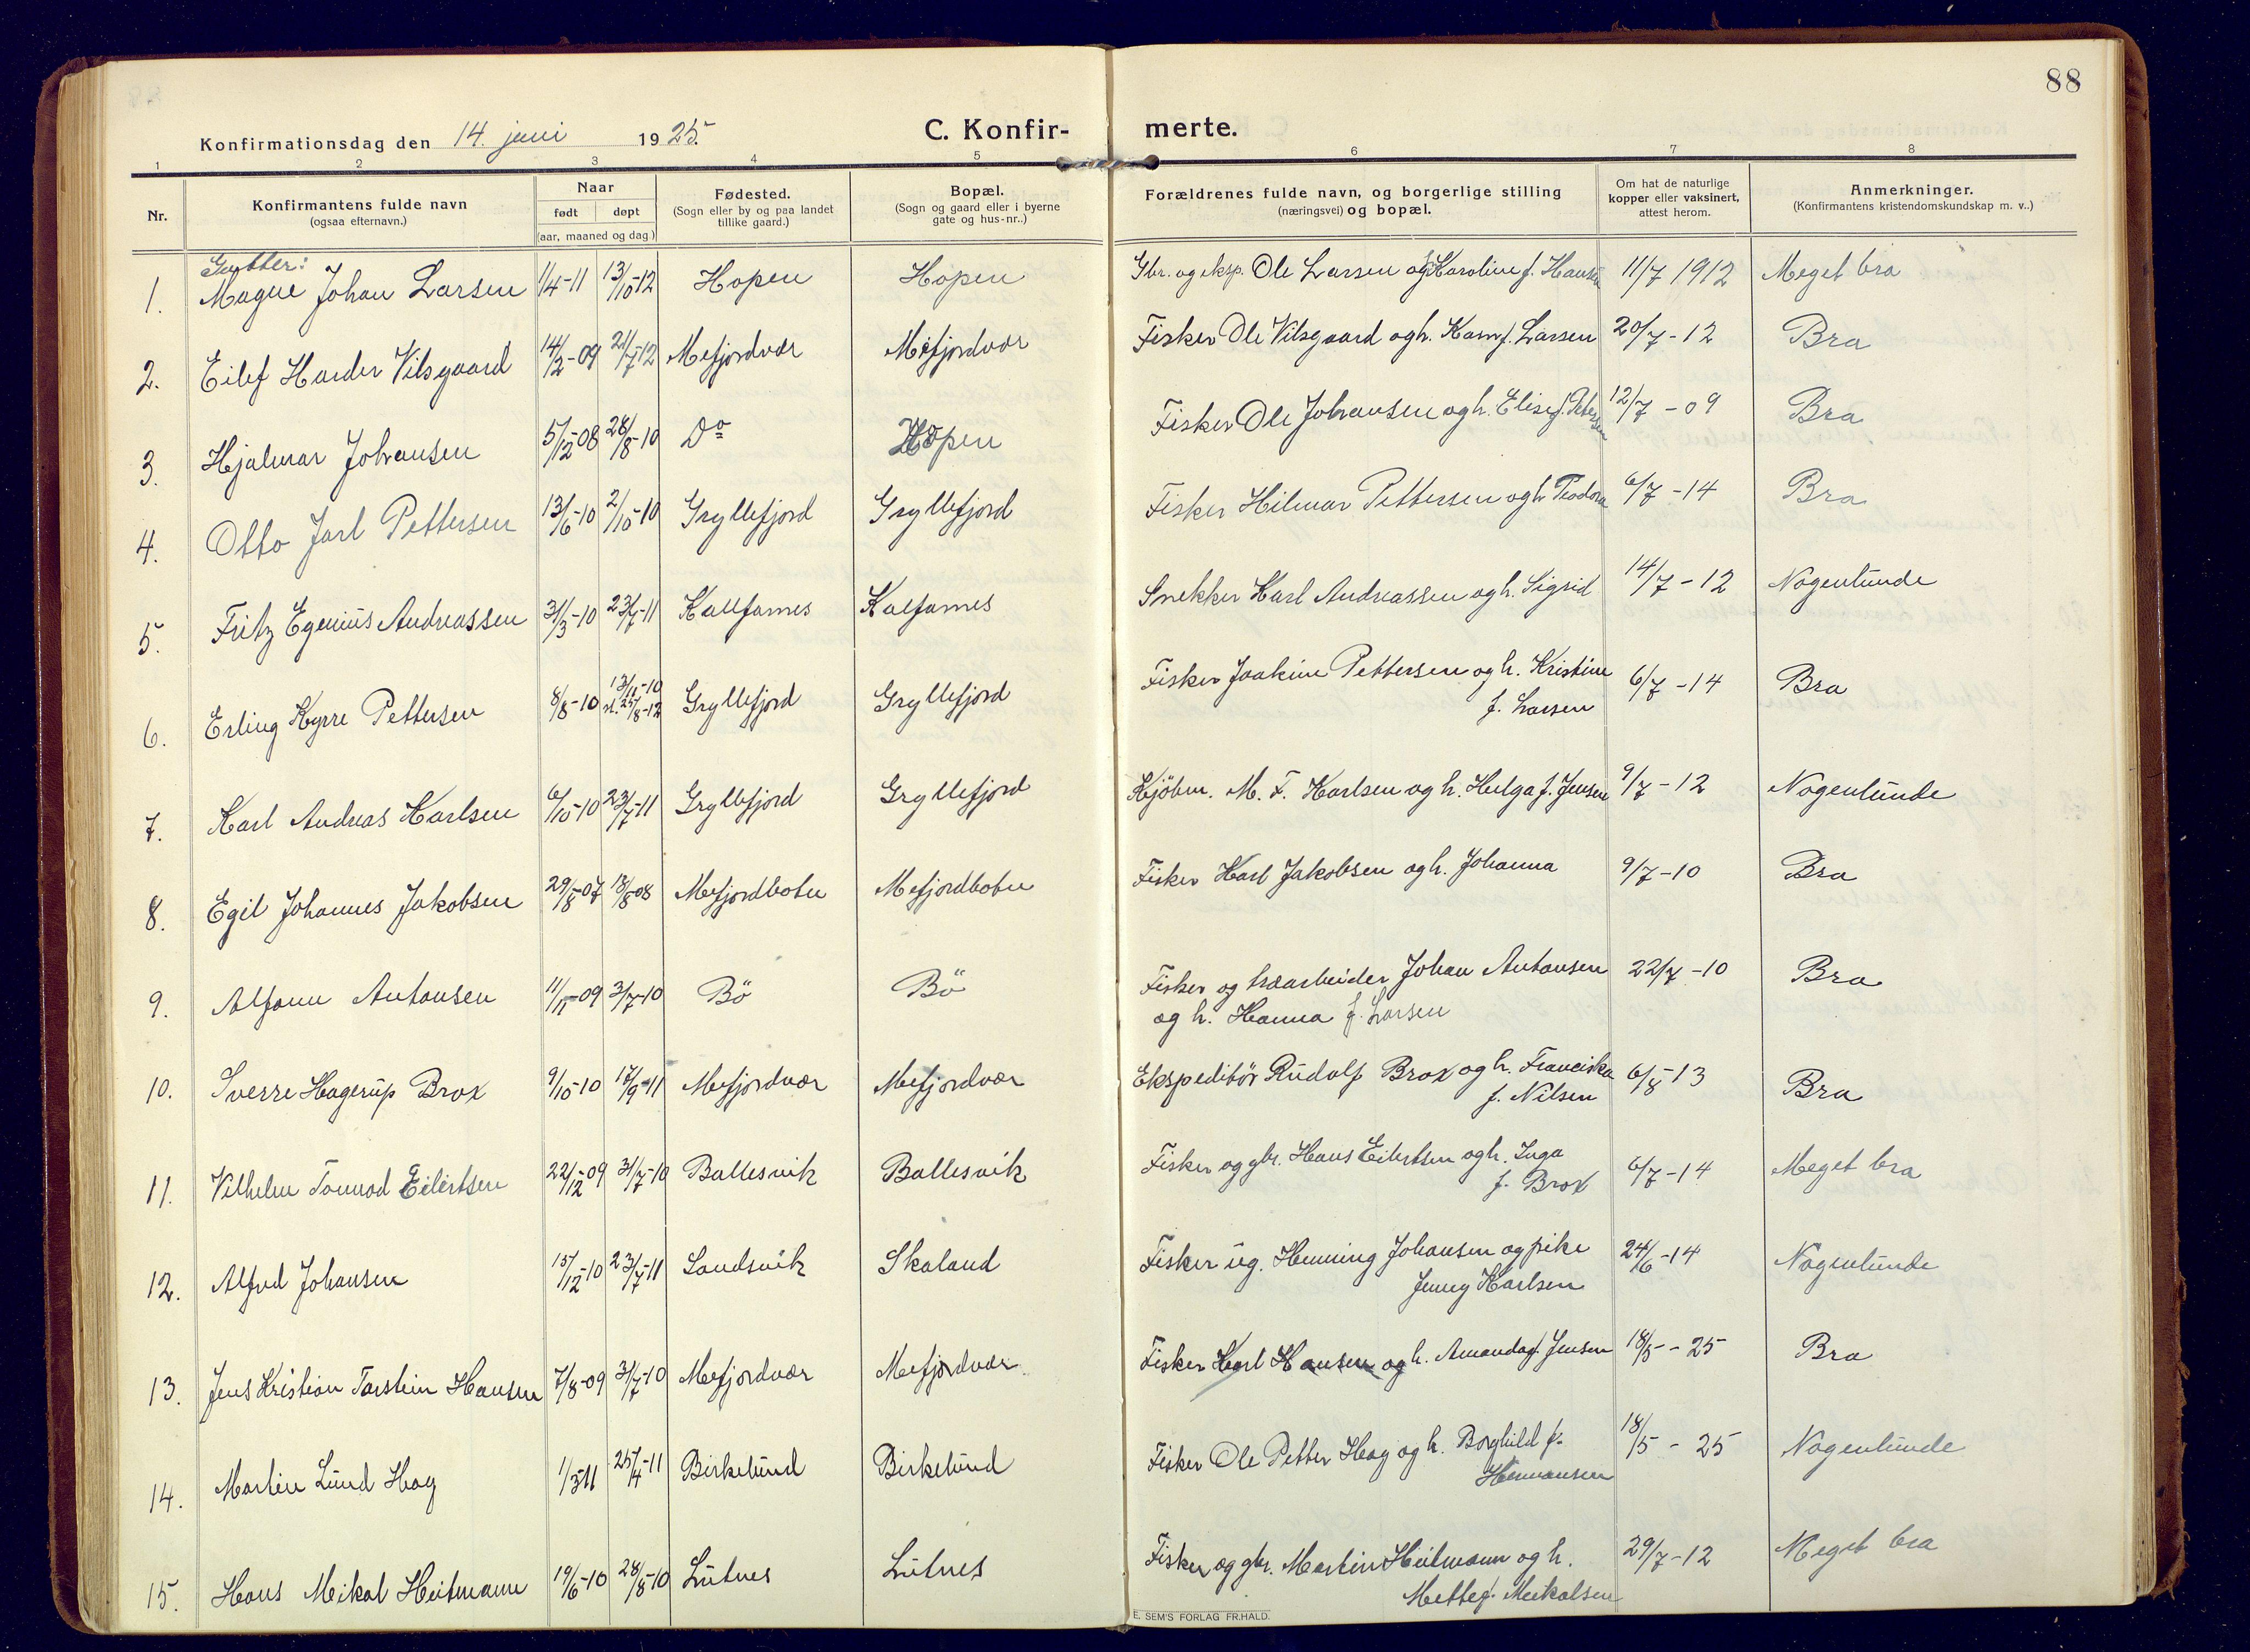 SATØ, Mefjord/Berg sokneprestkontor, G/Ga/Gaa: Ministerialbok nr. 9, 1916-1928, s. 88